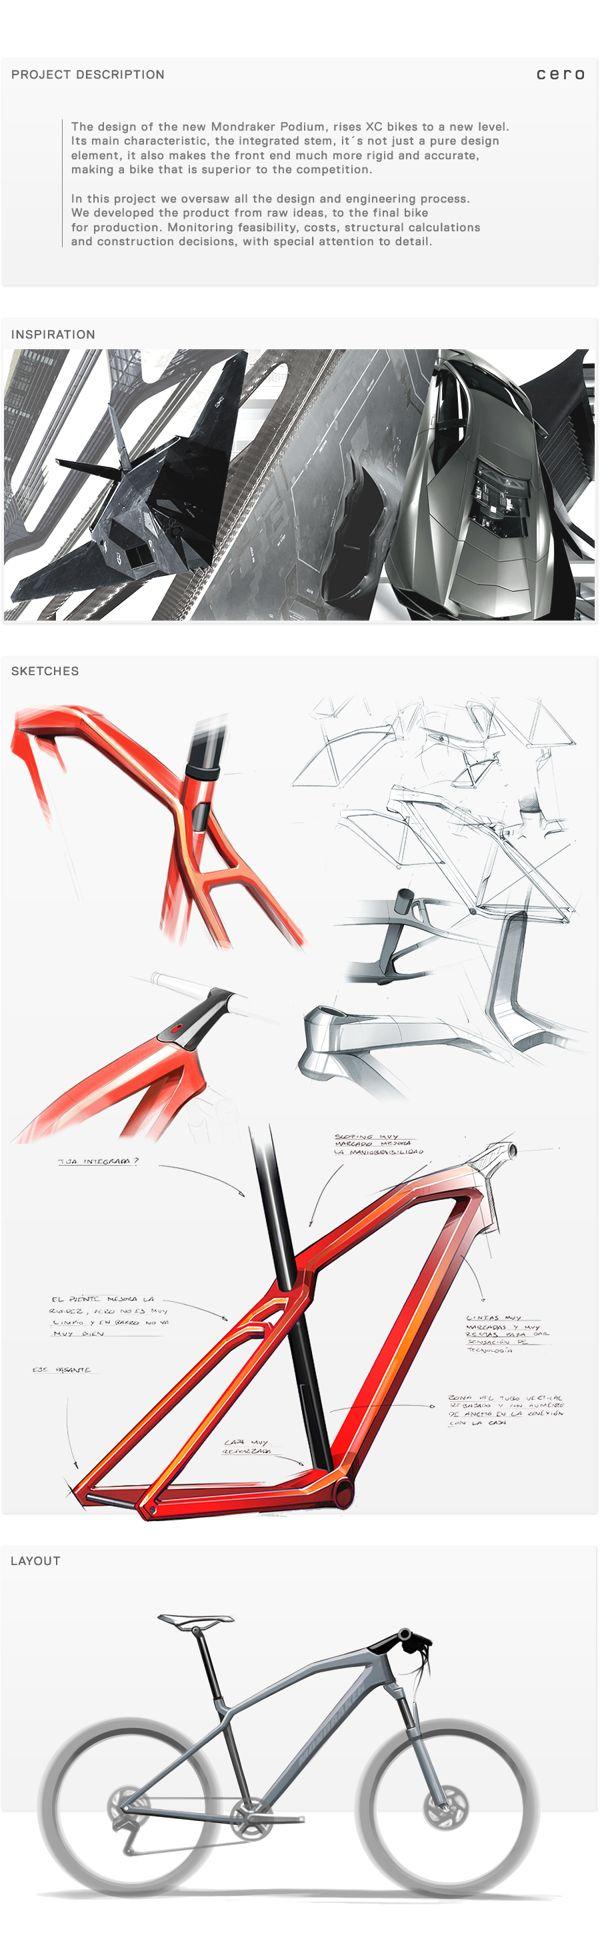 Podium by Cero , via Behance #id #design #product #sketch